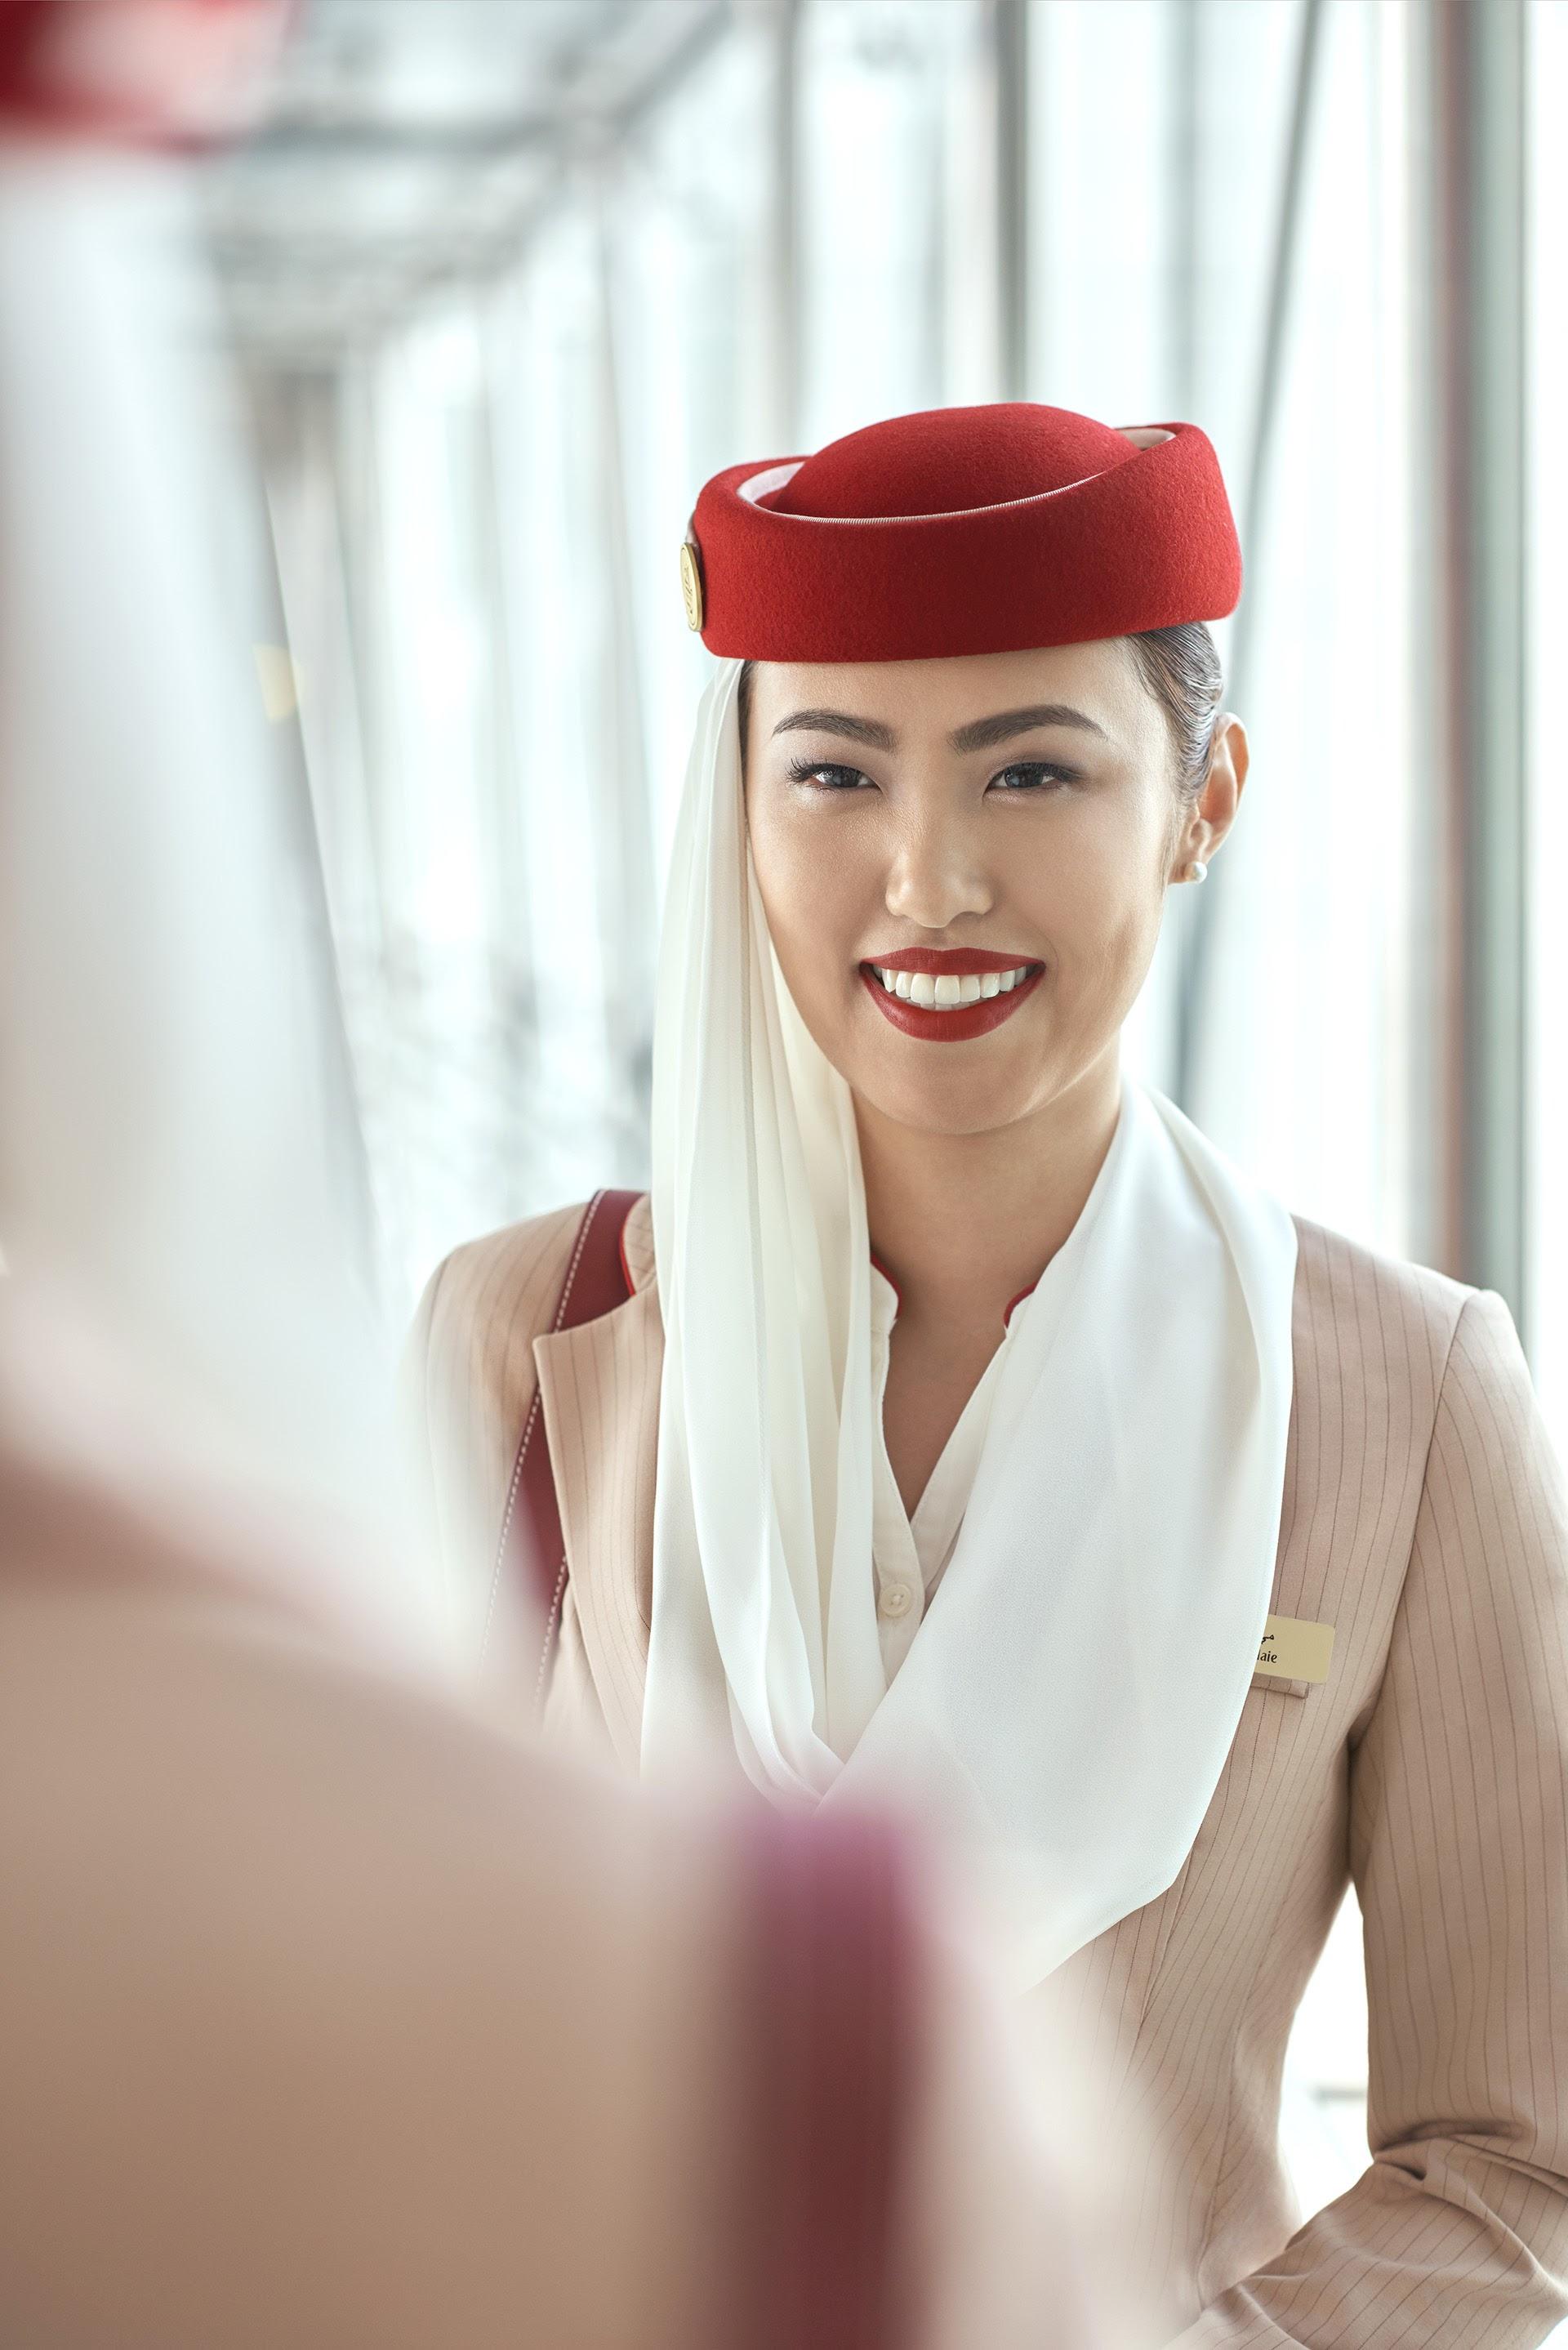 17-02-23_Emirates_3661_WORK.jpg